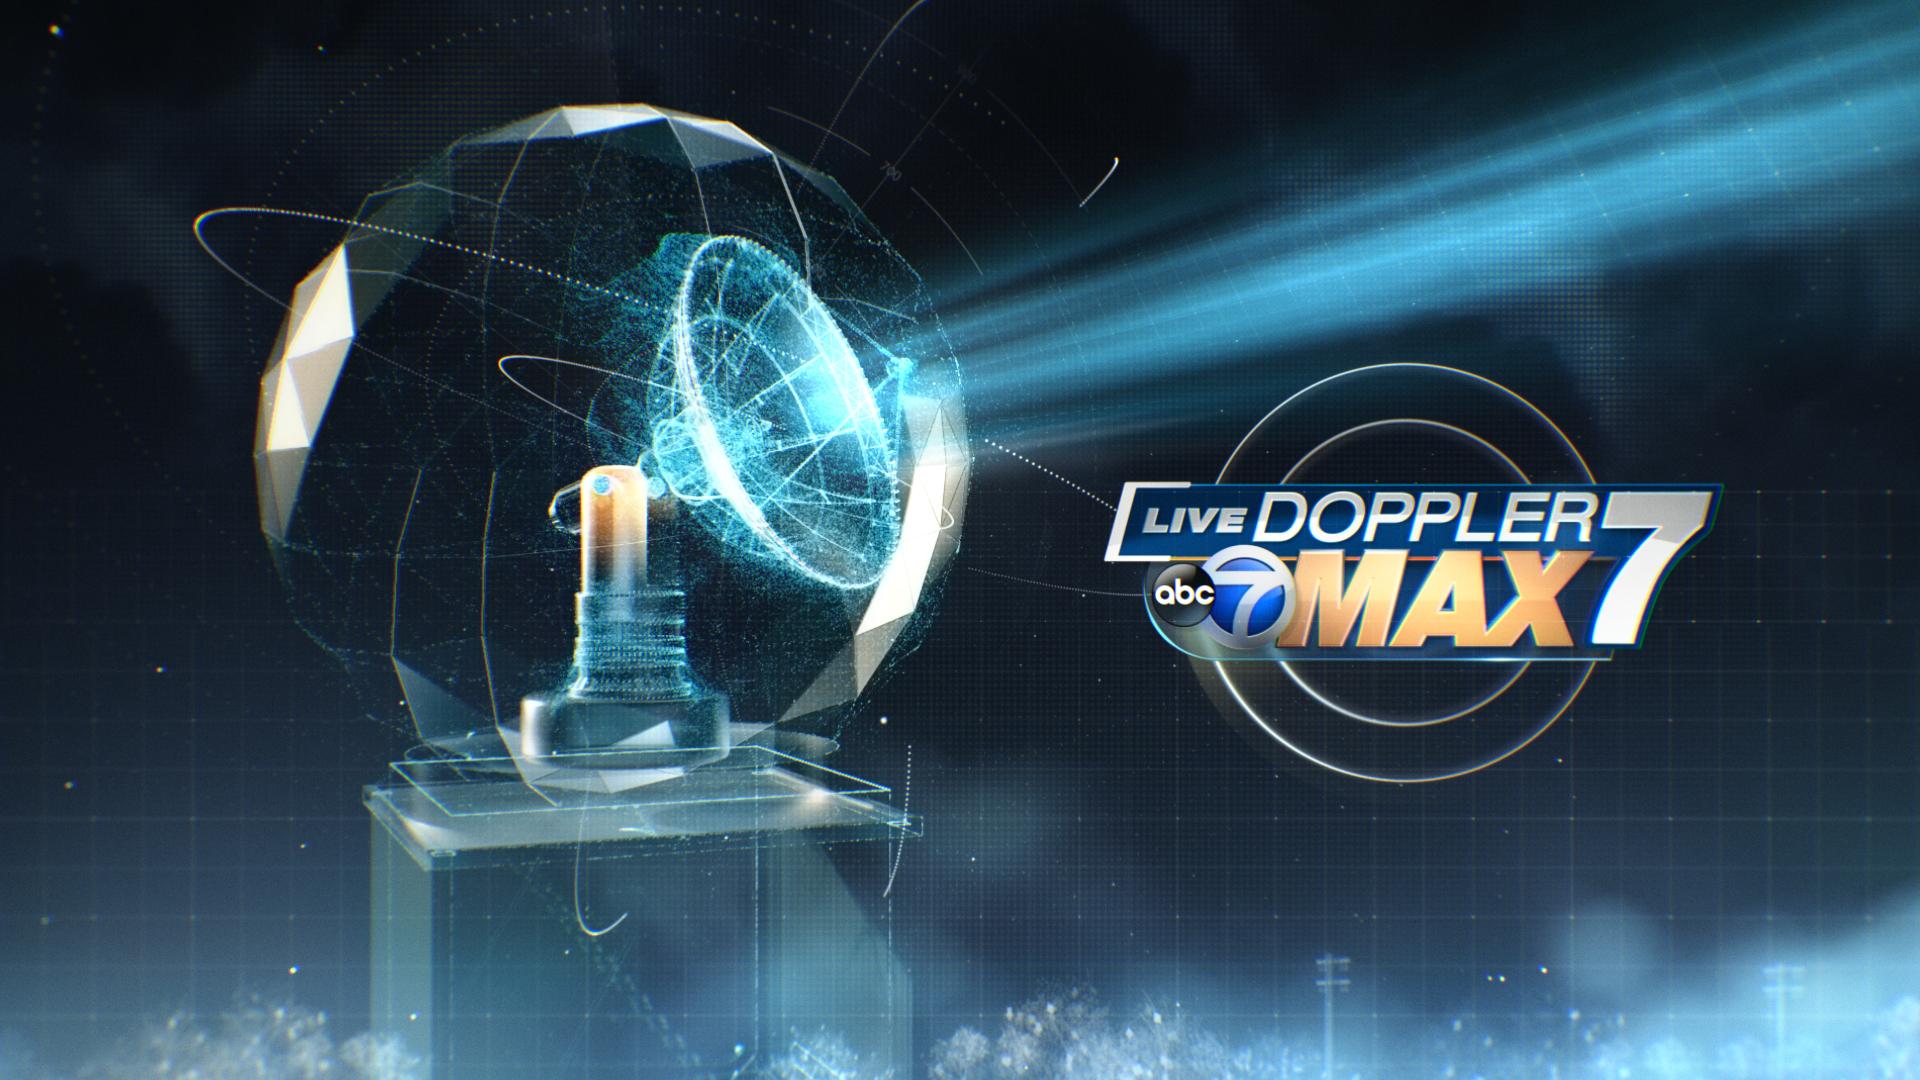 Doppler 7 Max Abc